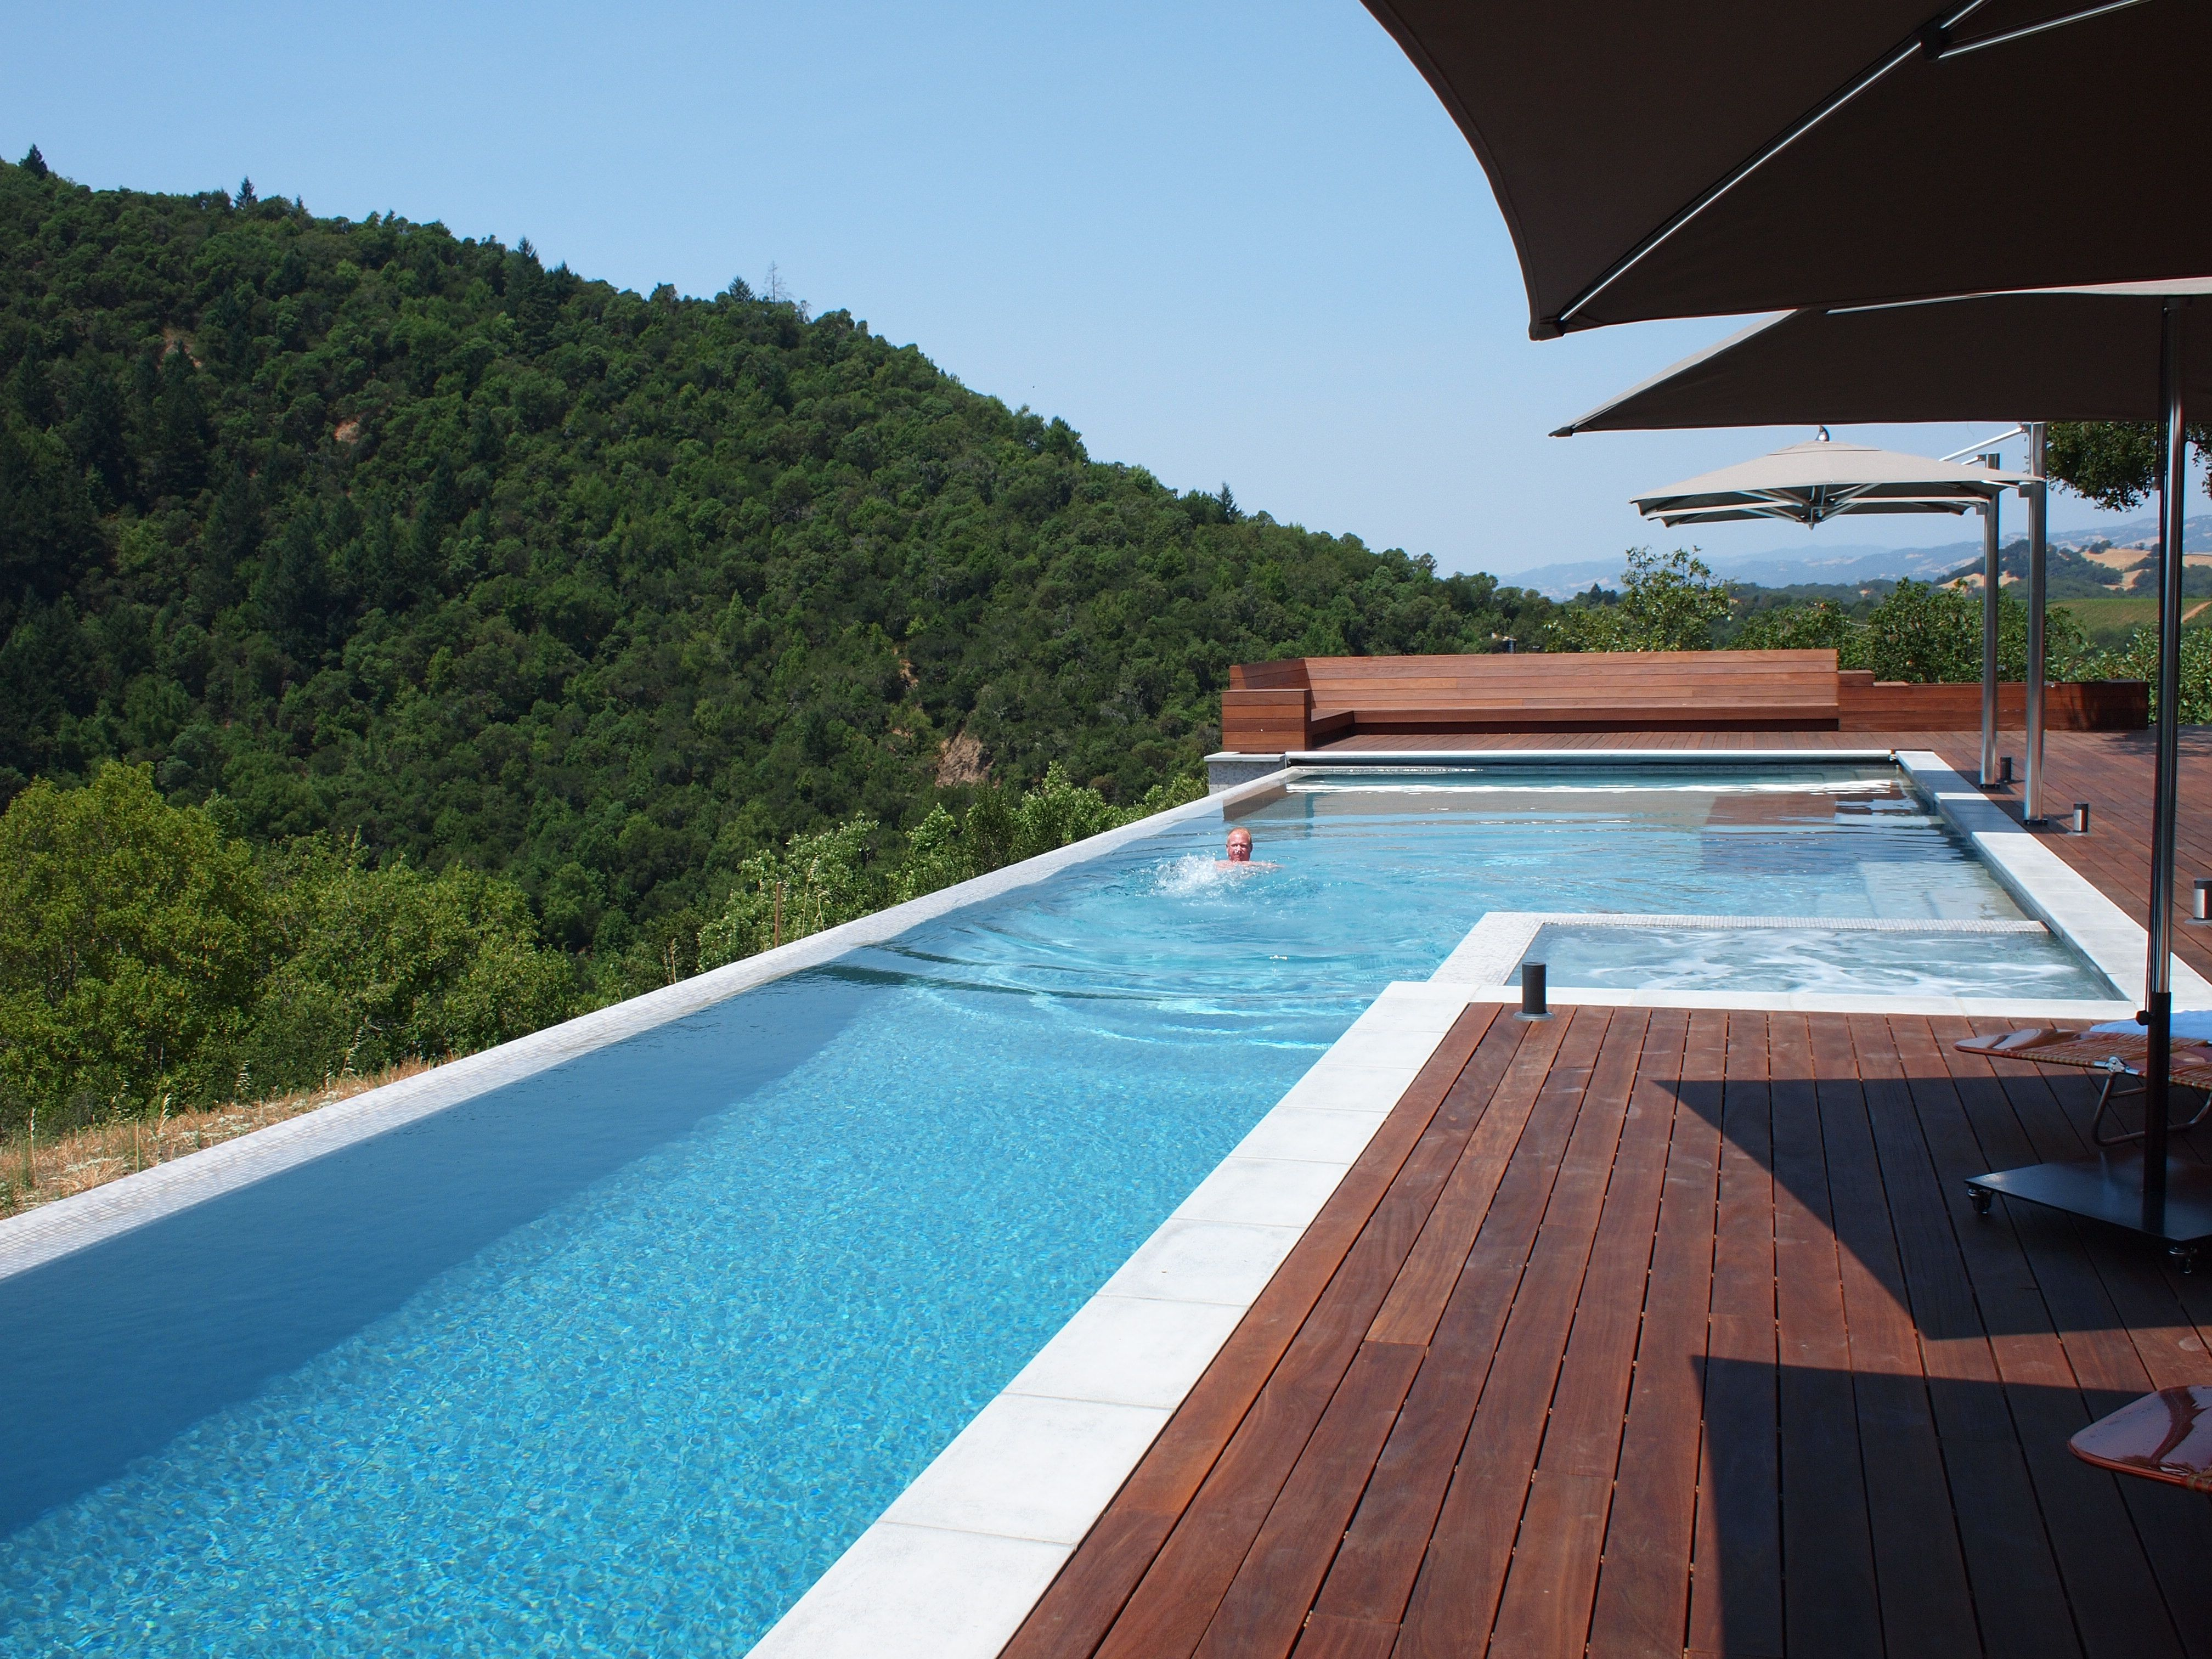 Infinity pool at a beautiful new house in Healdsberg | Favorite ...